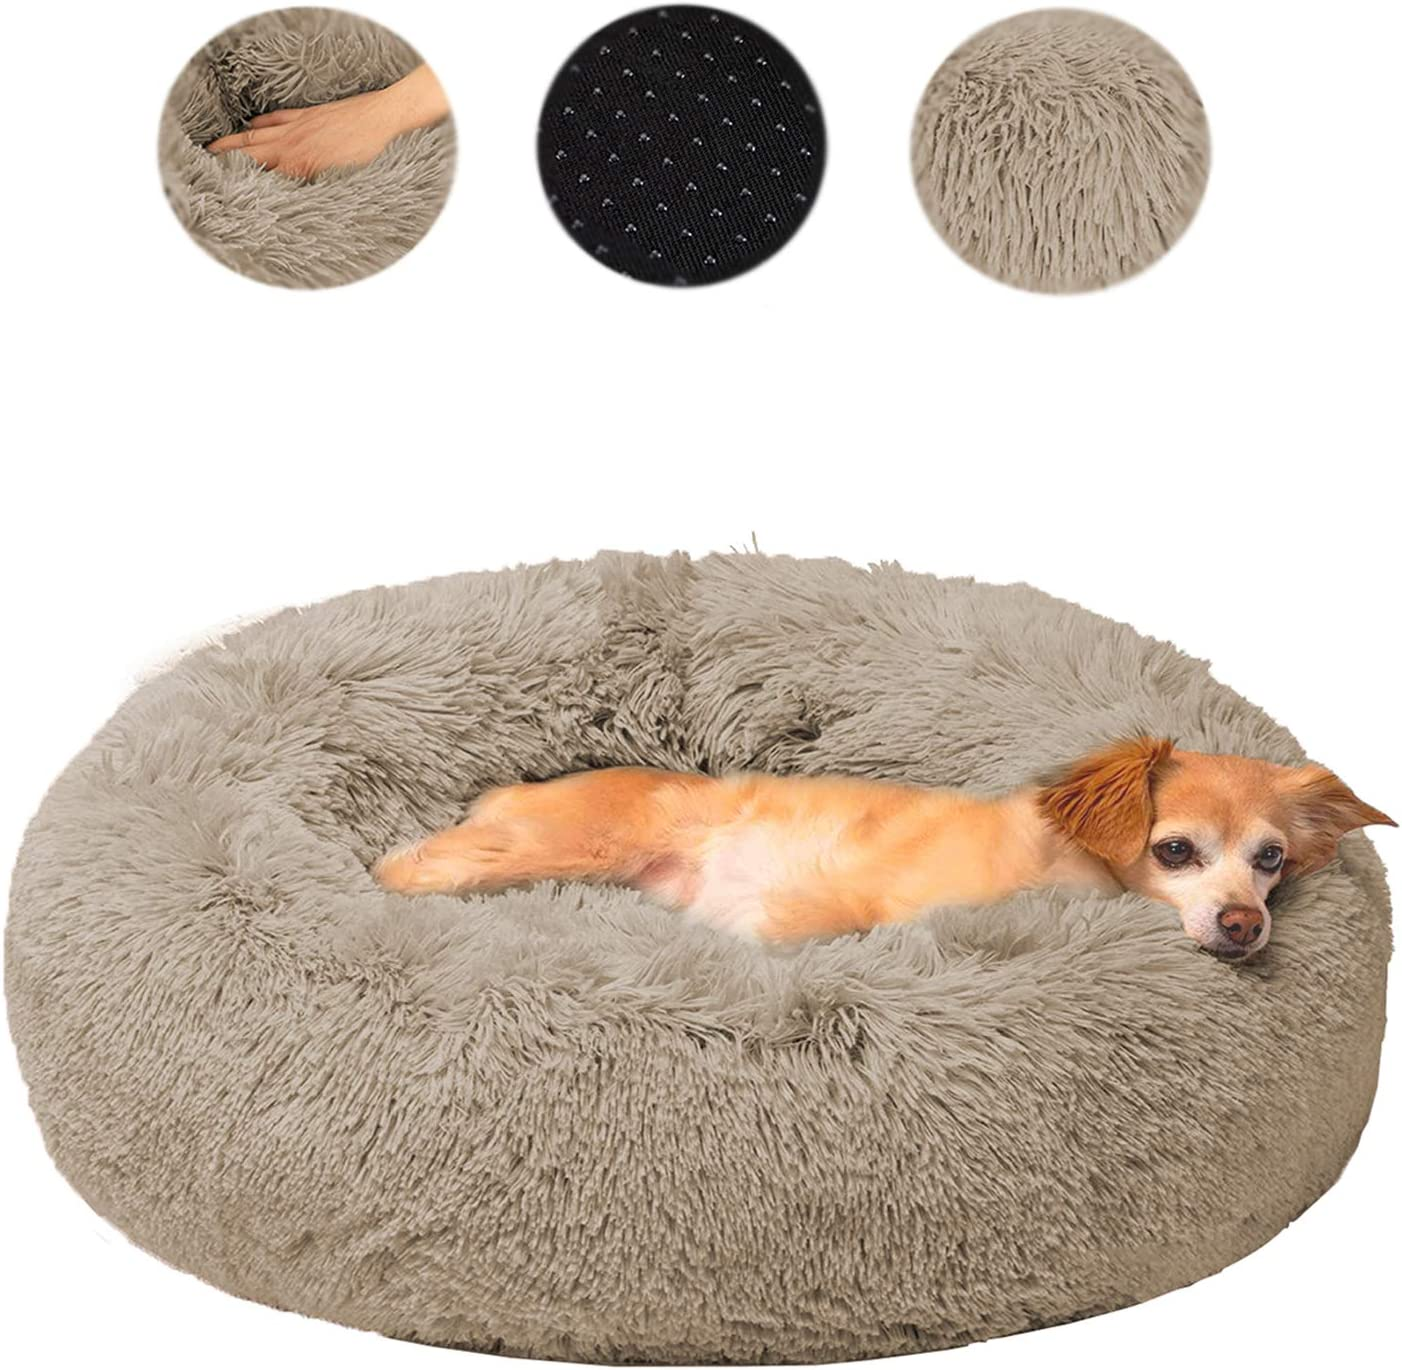 XIRGS Dog Max 41% Award-winning store OFF Calming Bed Orthopedic Soft Donut Cuddler Ultra Round